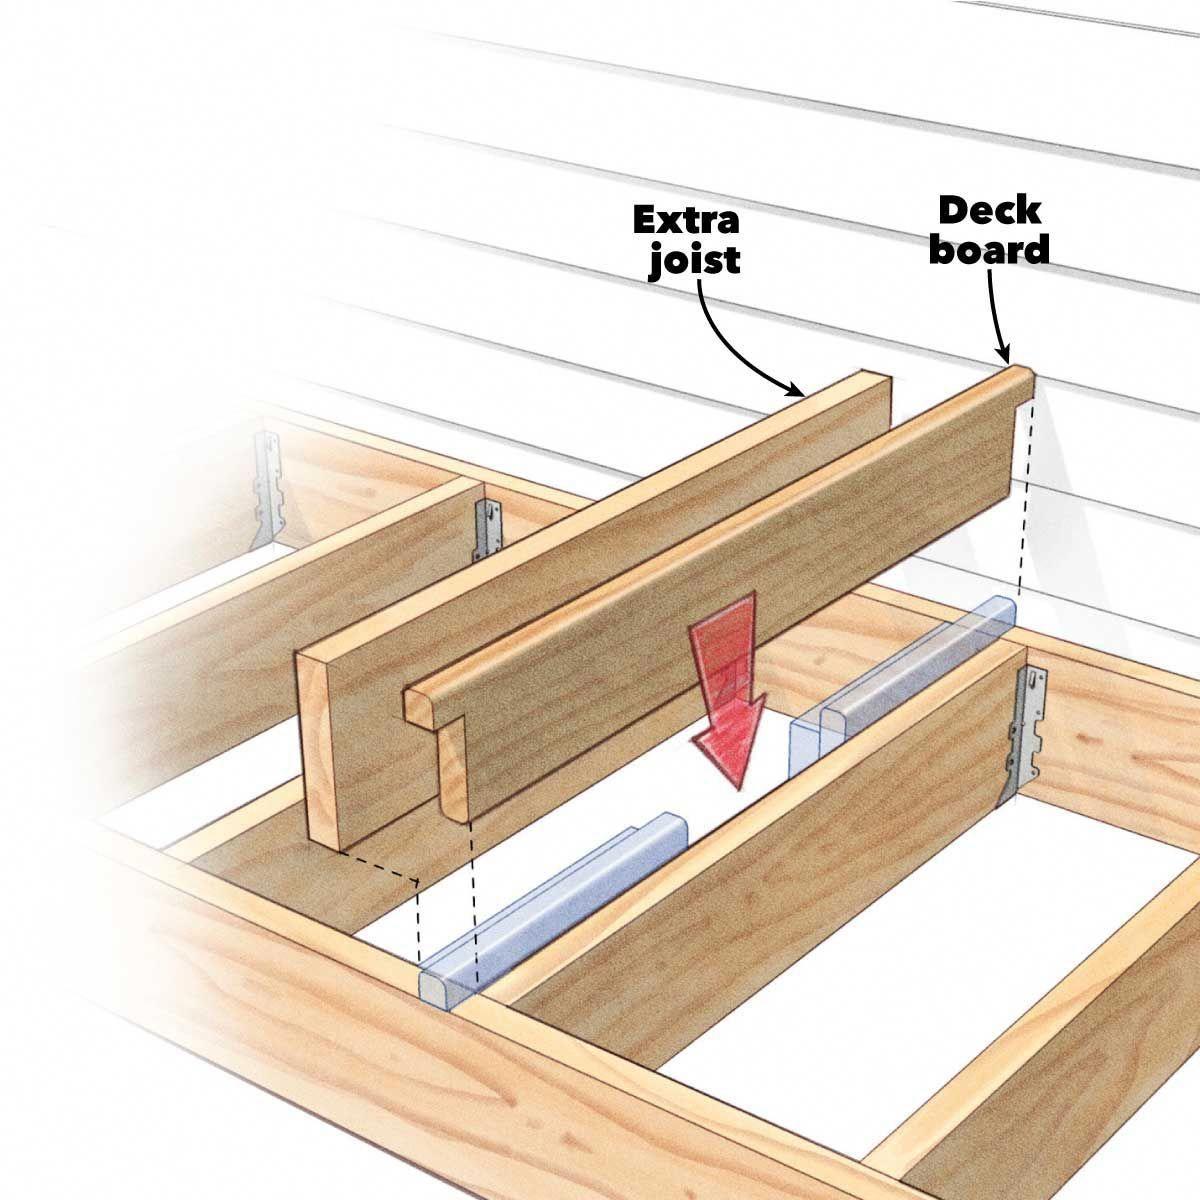 Delightful Photo Frontdeck In 2020 Building A Deck Diy Deck Cool Deck